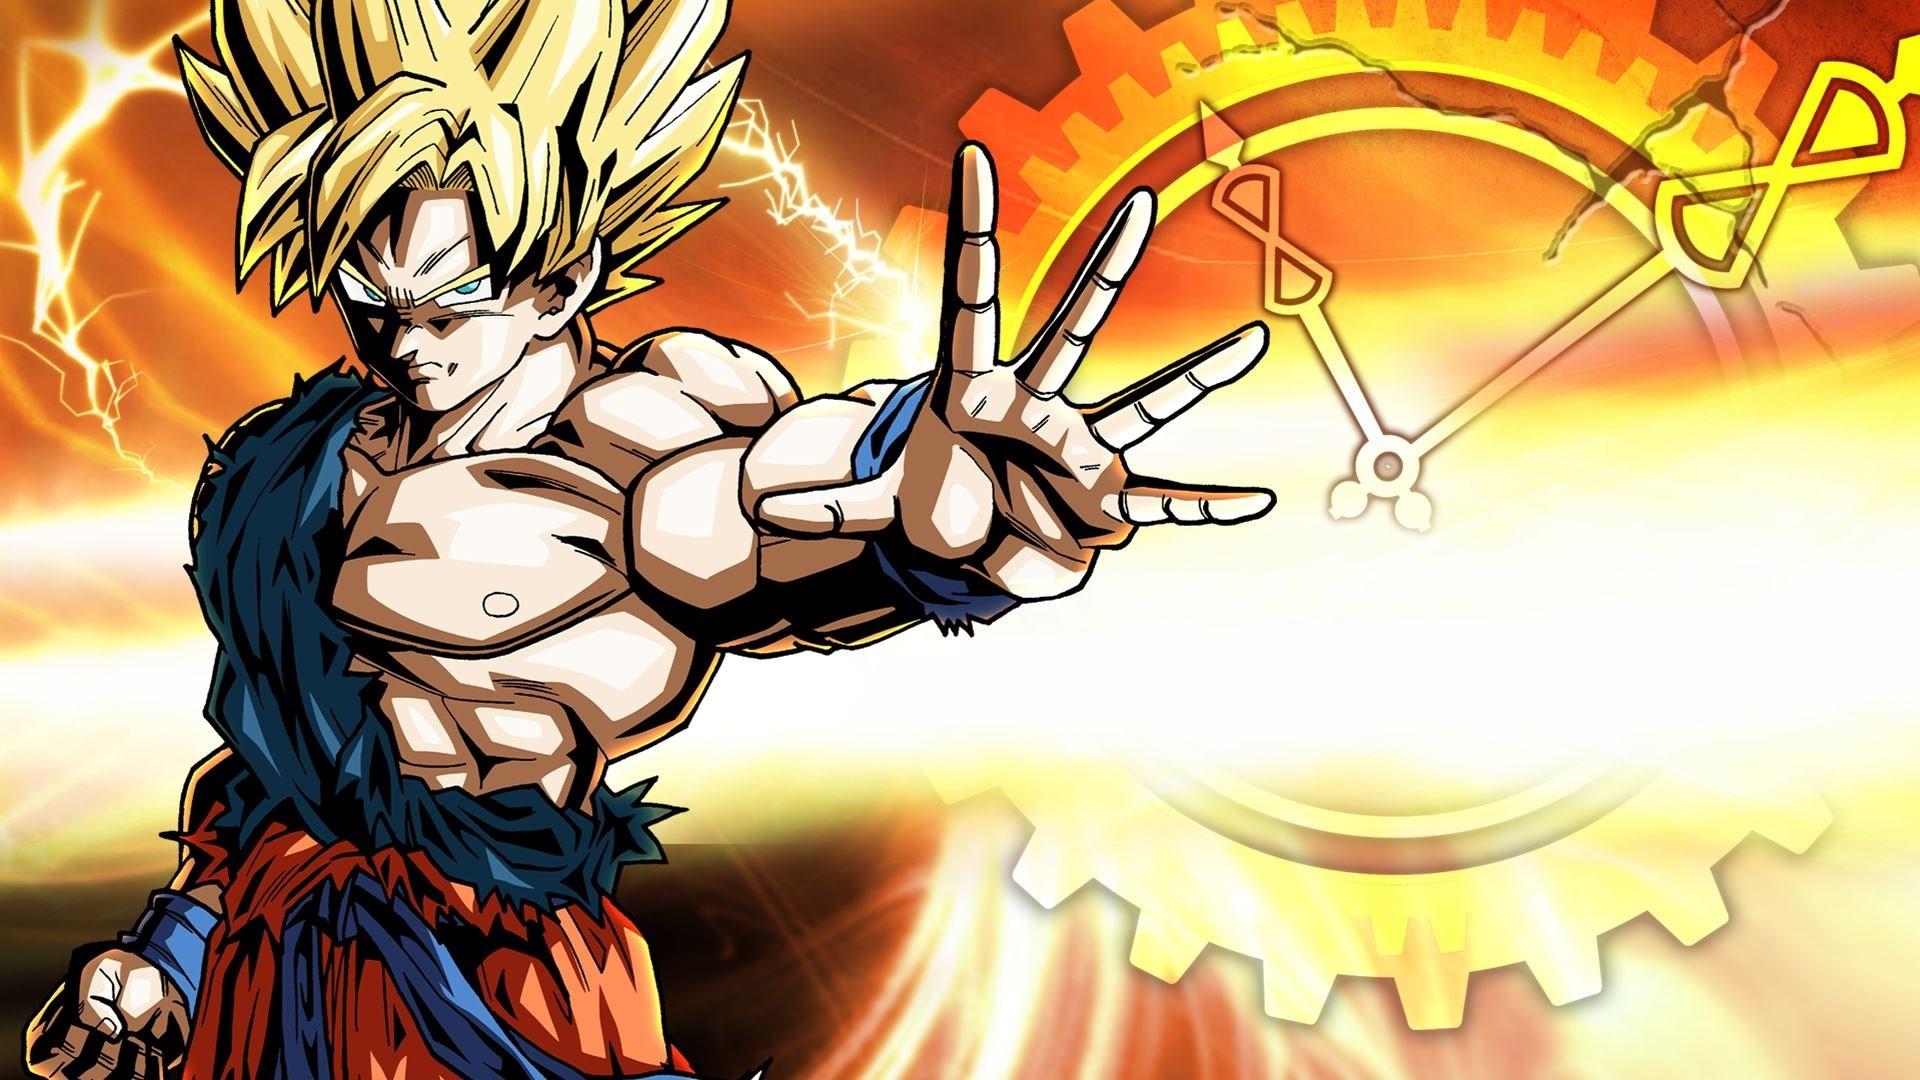 1920x1080 Wallpaper Dragon Ball Z Goku Aggression Guy